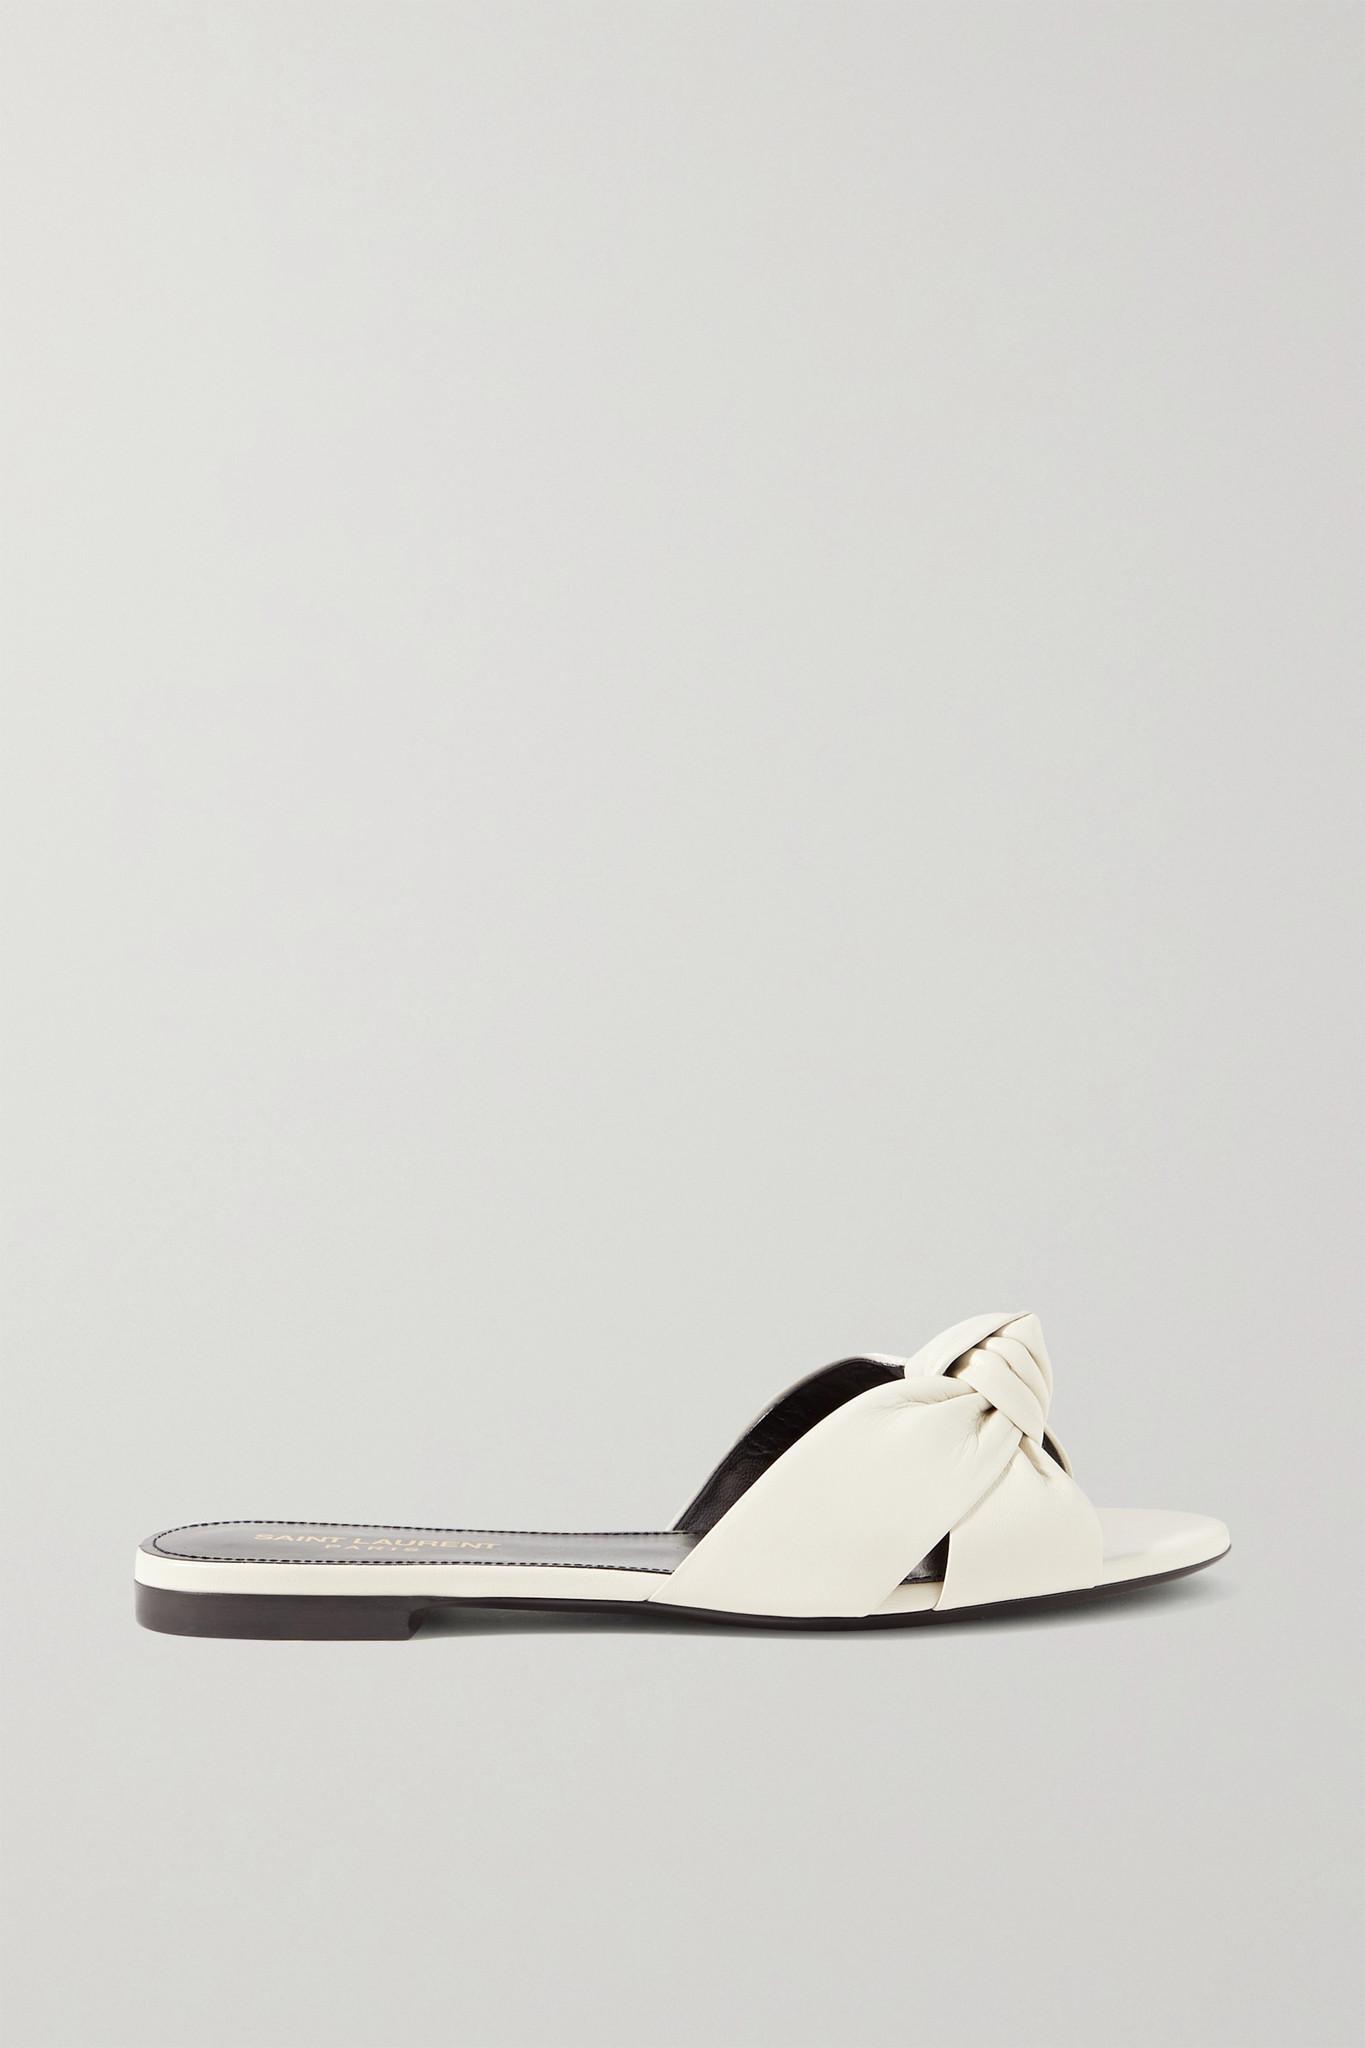 SAINT LAURENT - Bianca Knotted Leather Slides - Ivory - IT39